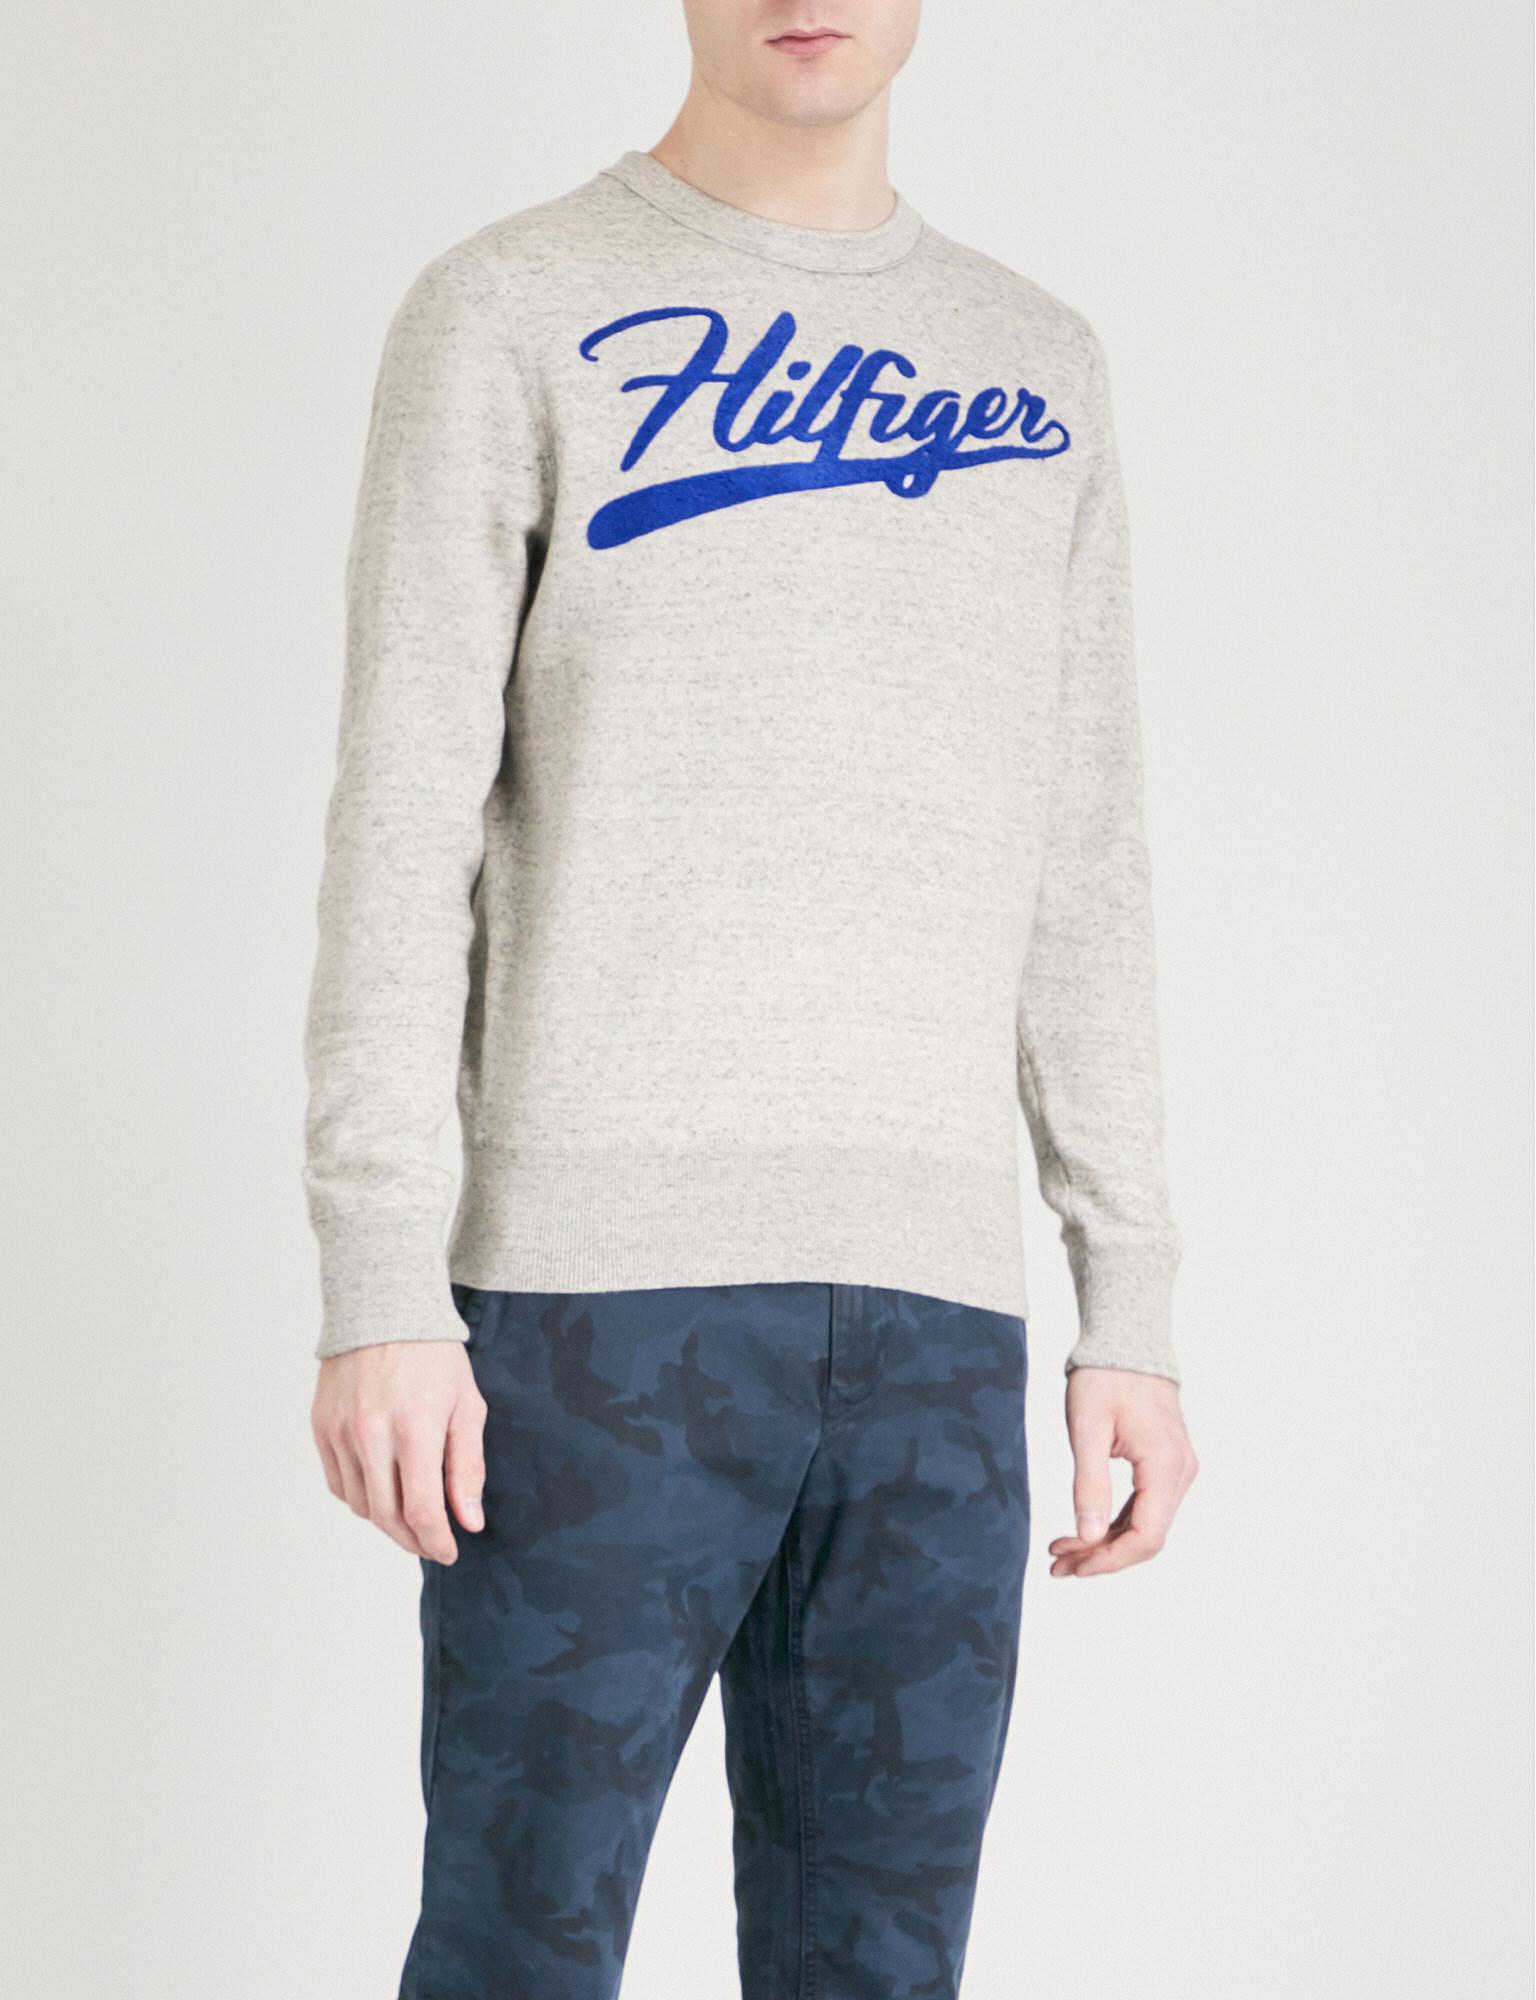 4b9f3b7901ef Lyst - Tommy Hilfiger Iggy Embroidered Logo Cotton-jersey Sweatshirt ...